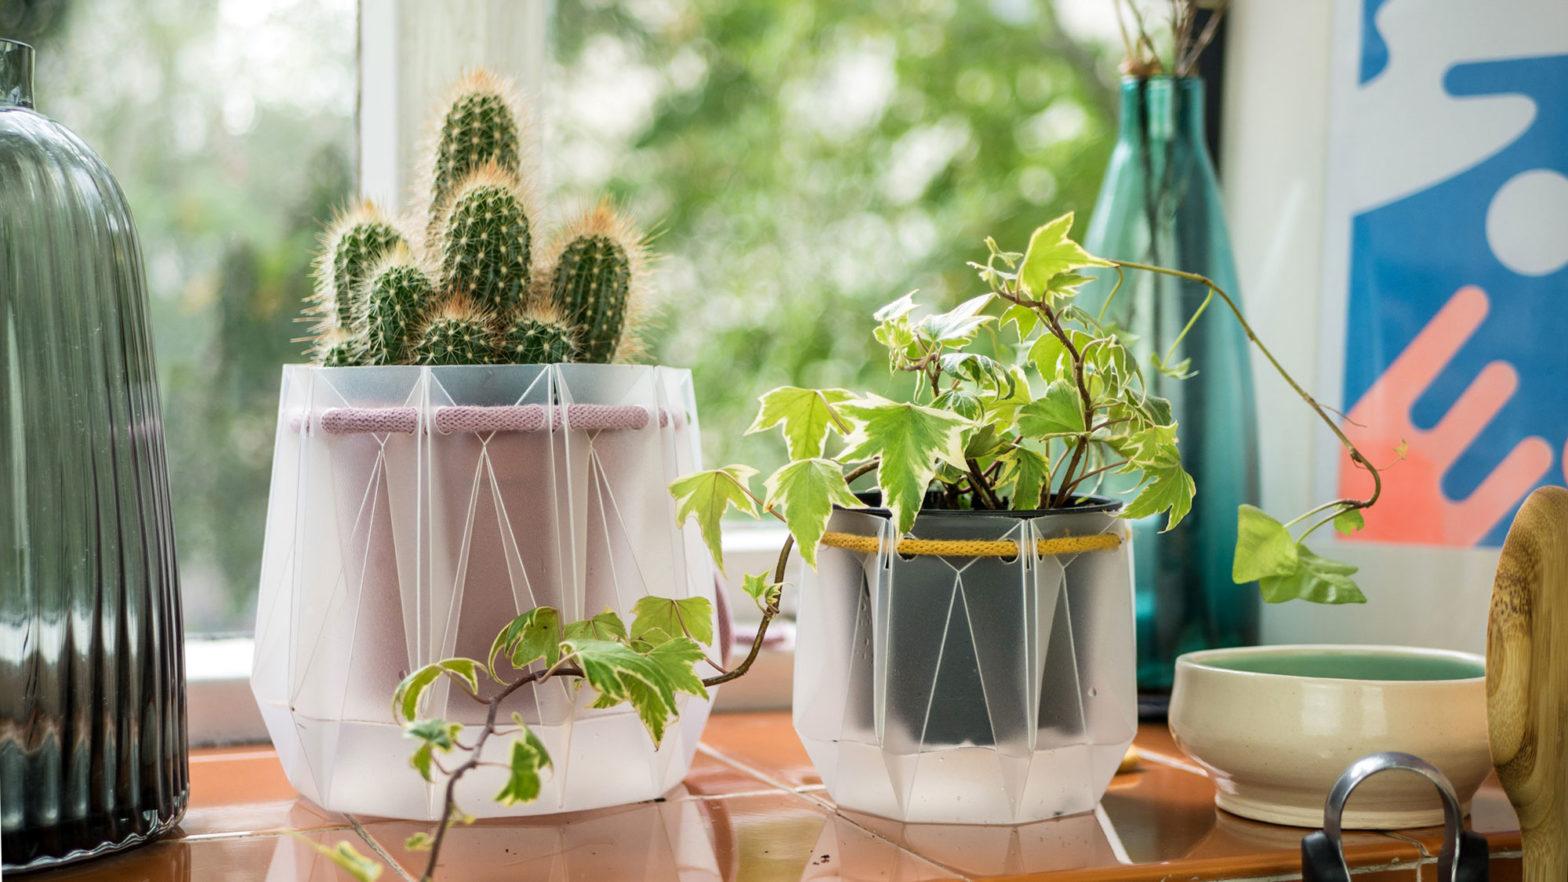 Potr Self-watering Origami Plant Pots